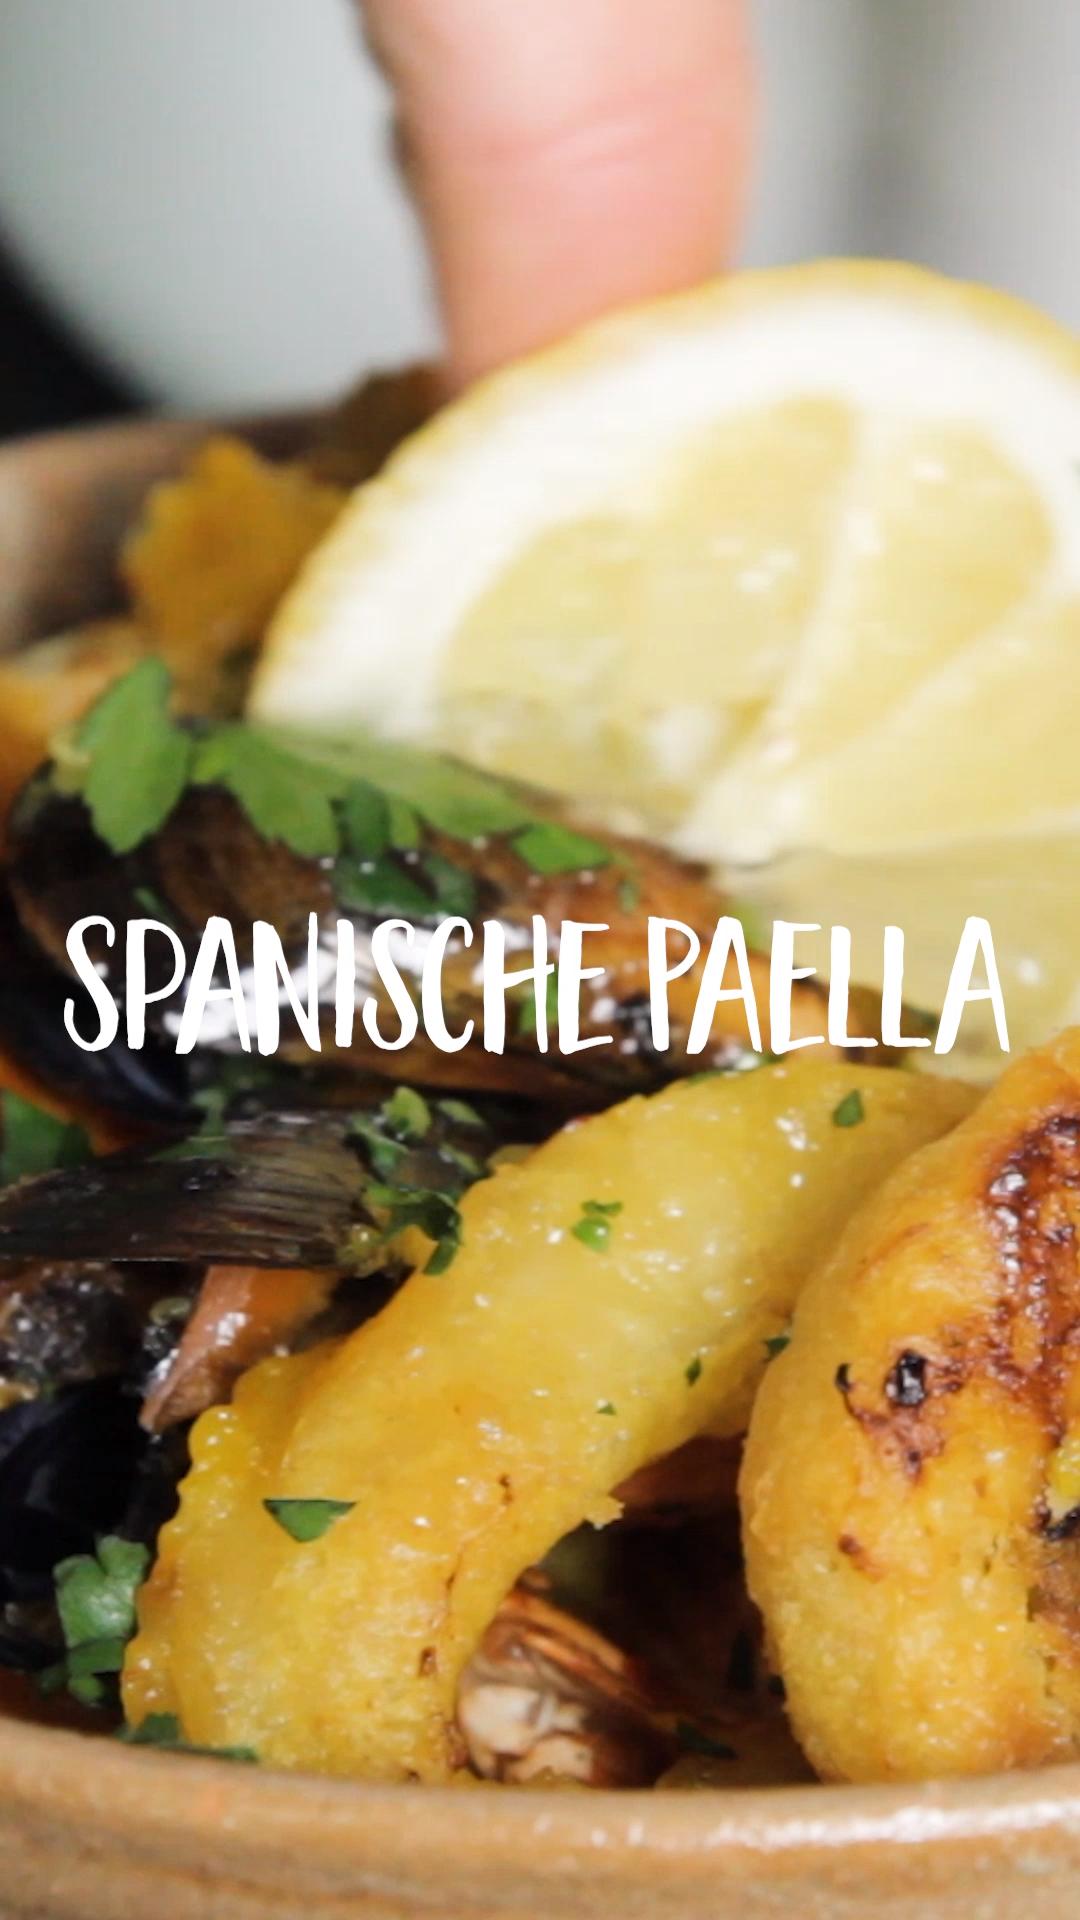 Photo of Original Spanish paella